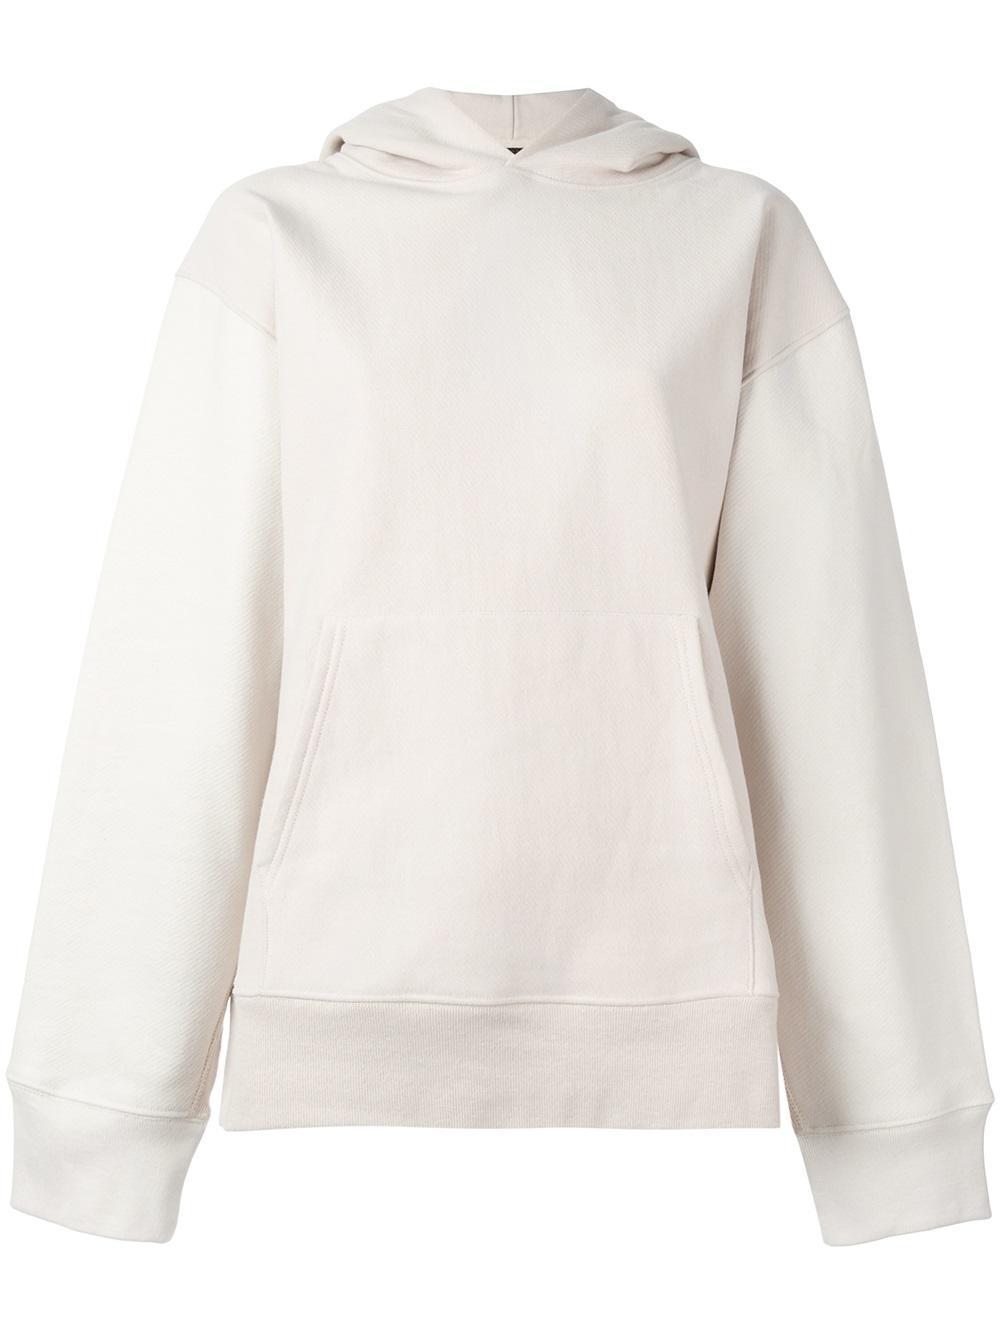 yeezy season 3 front pockets hoodie lyst. Black Bedroom Furniture Sets. Home Design Ideas